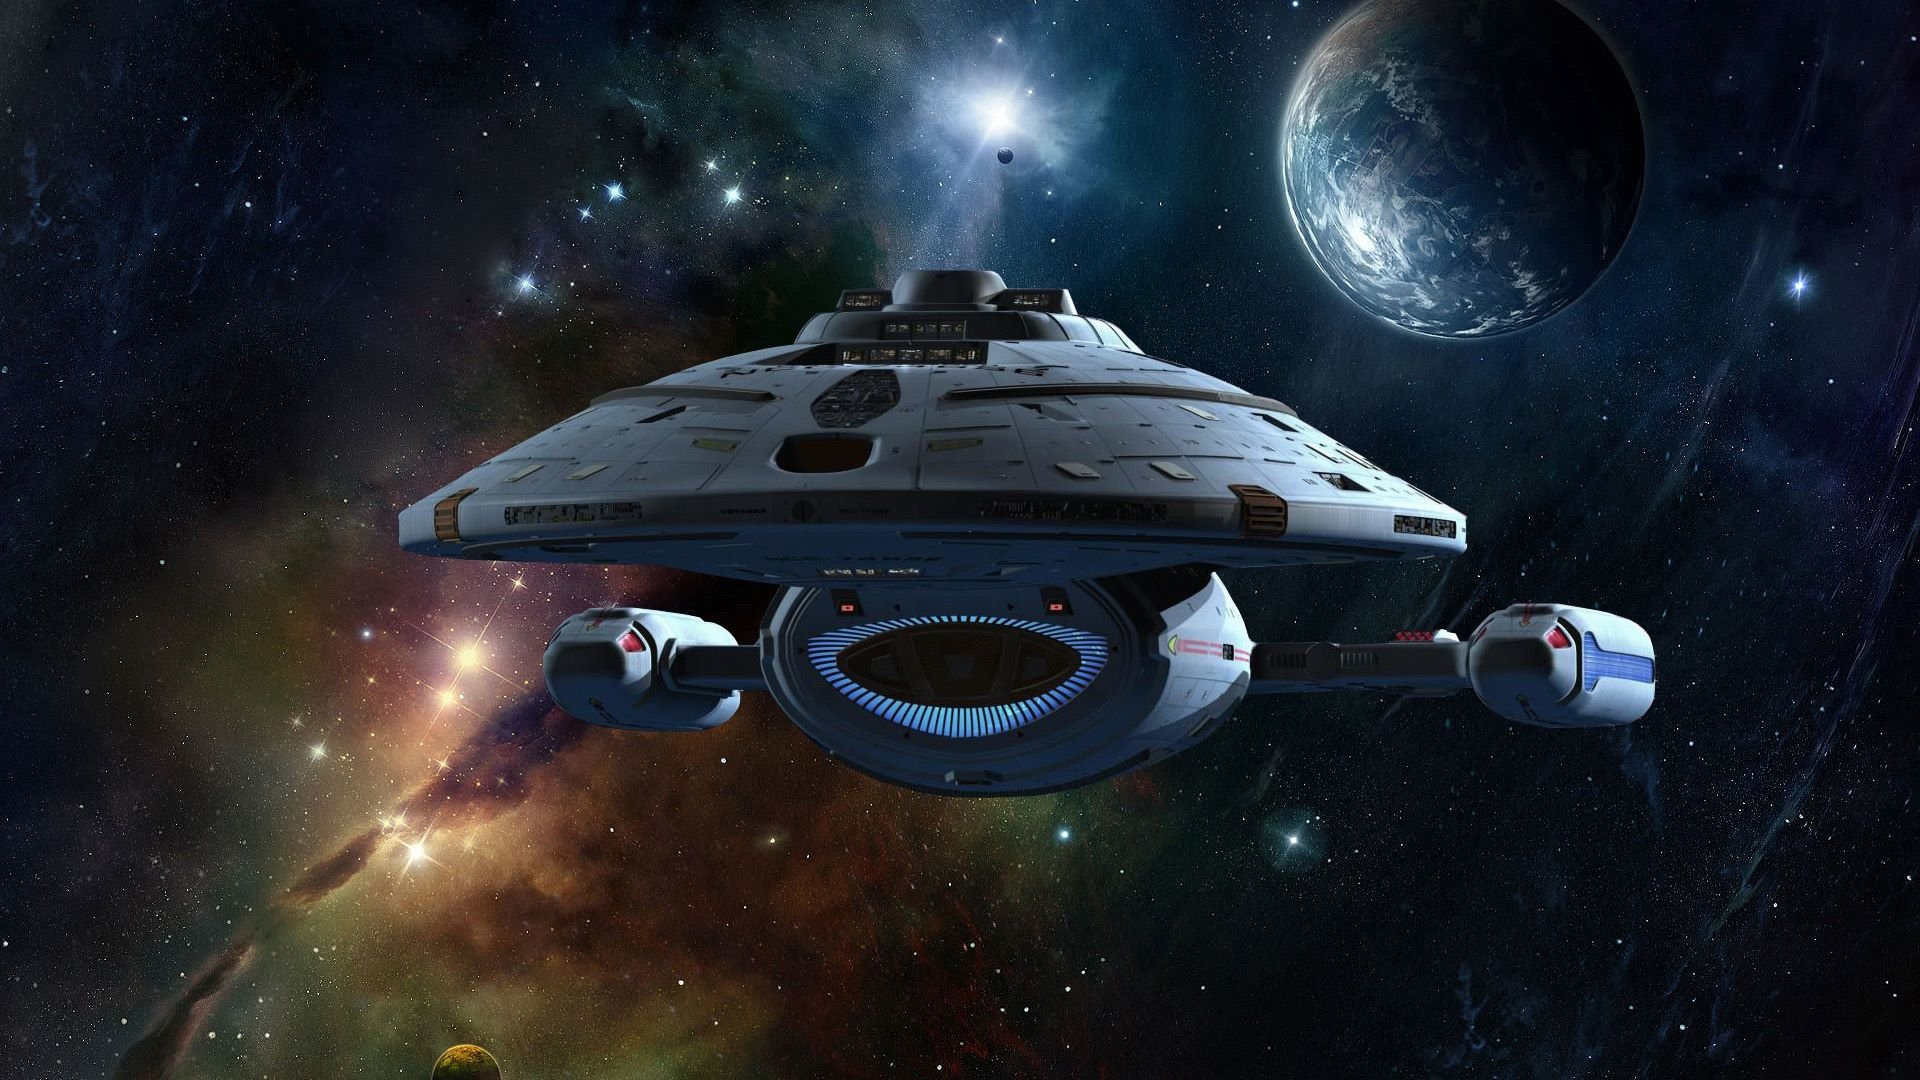 free download star trek: voyager wallpaper id:115470 full hd